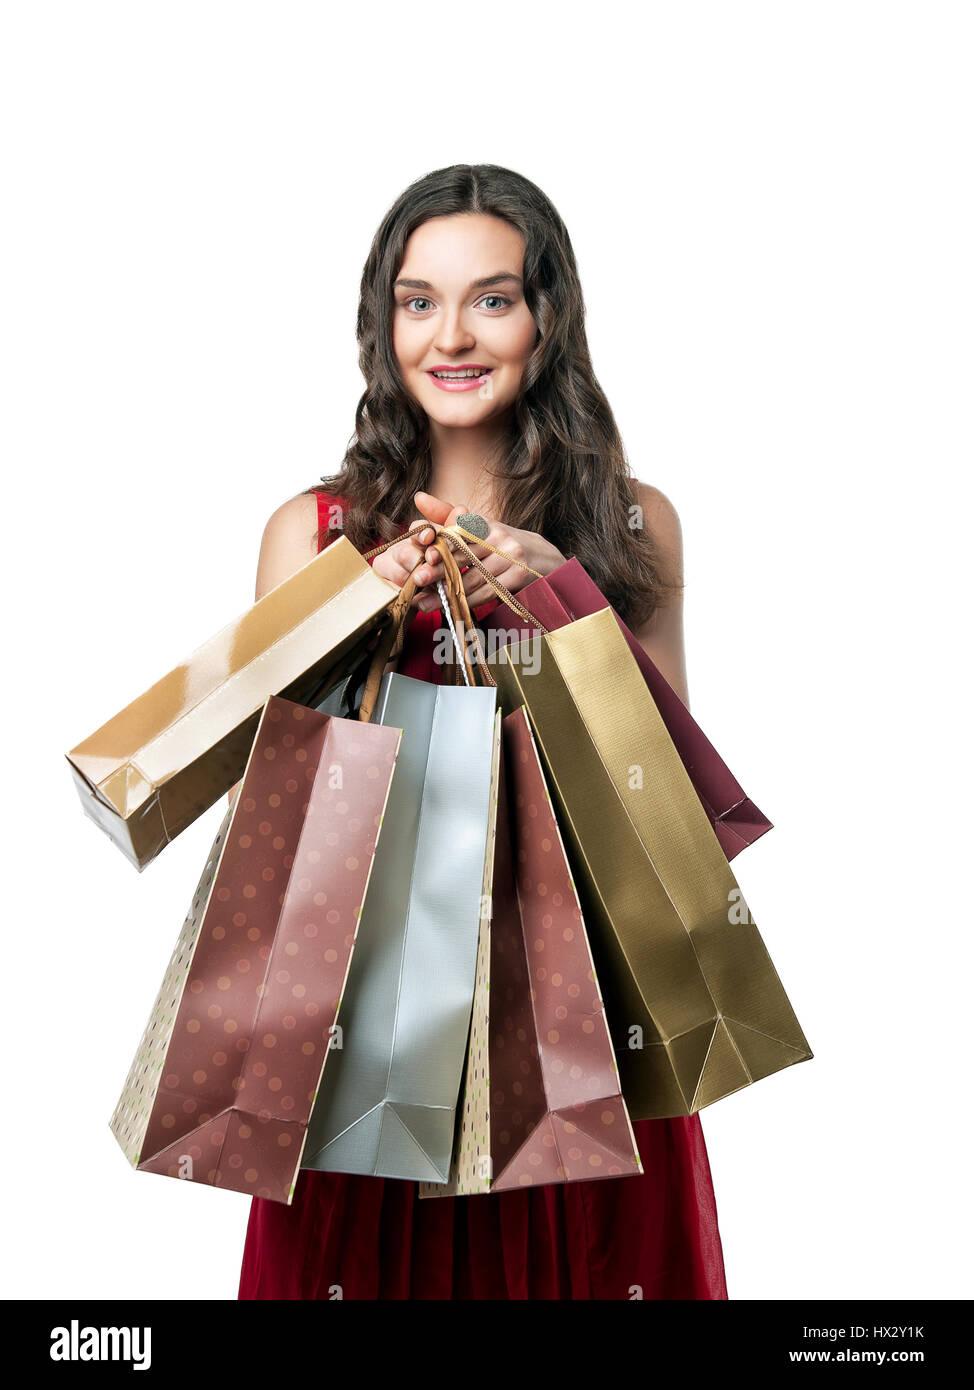 consumerism happiness